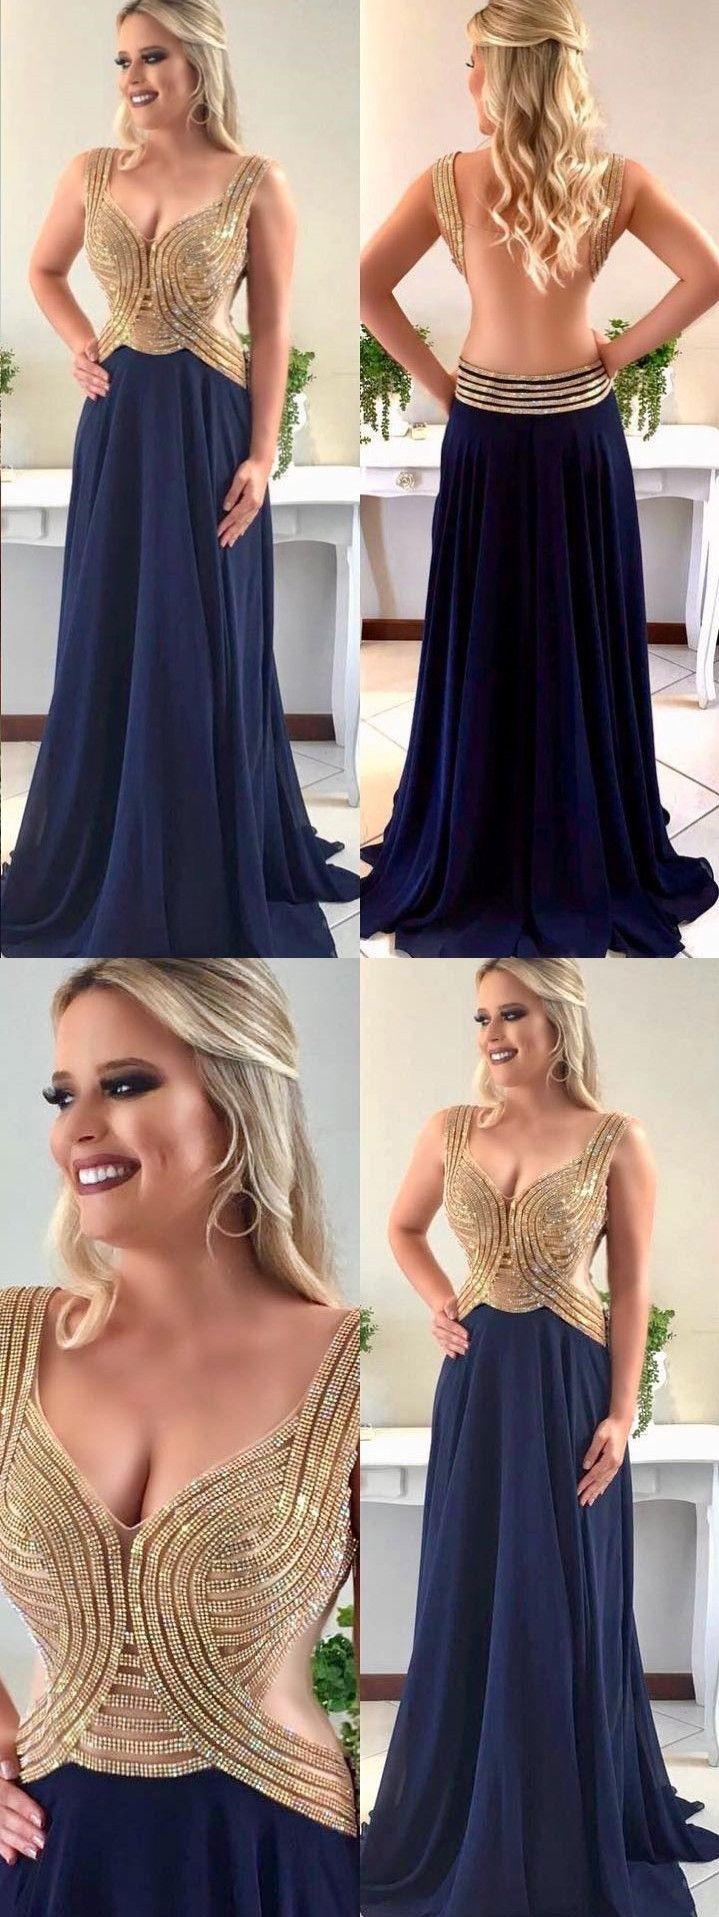 Sparkly prom dresses aline straps vneck long chiffon open back prom